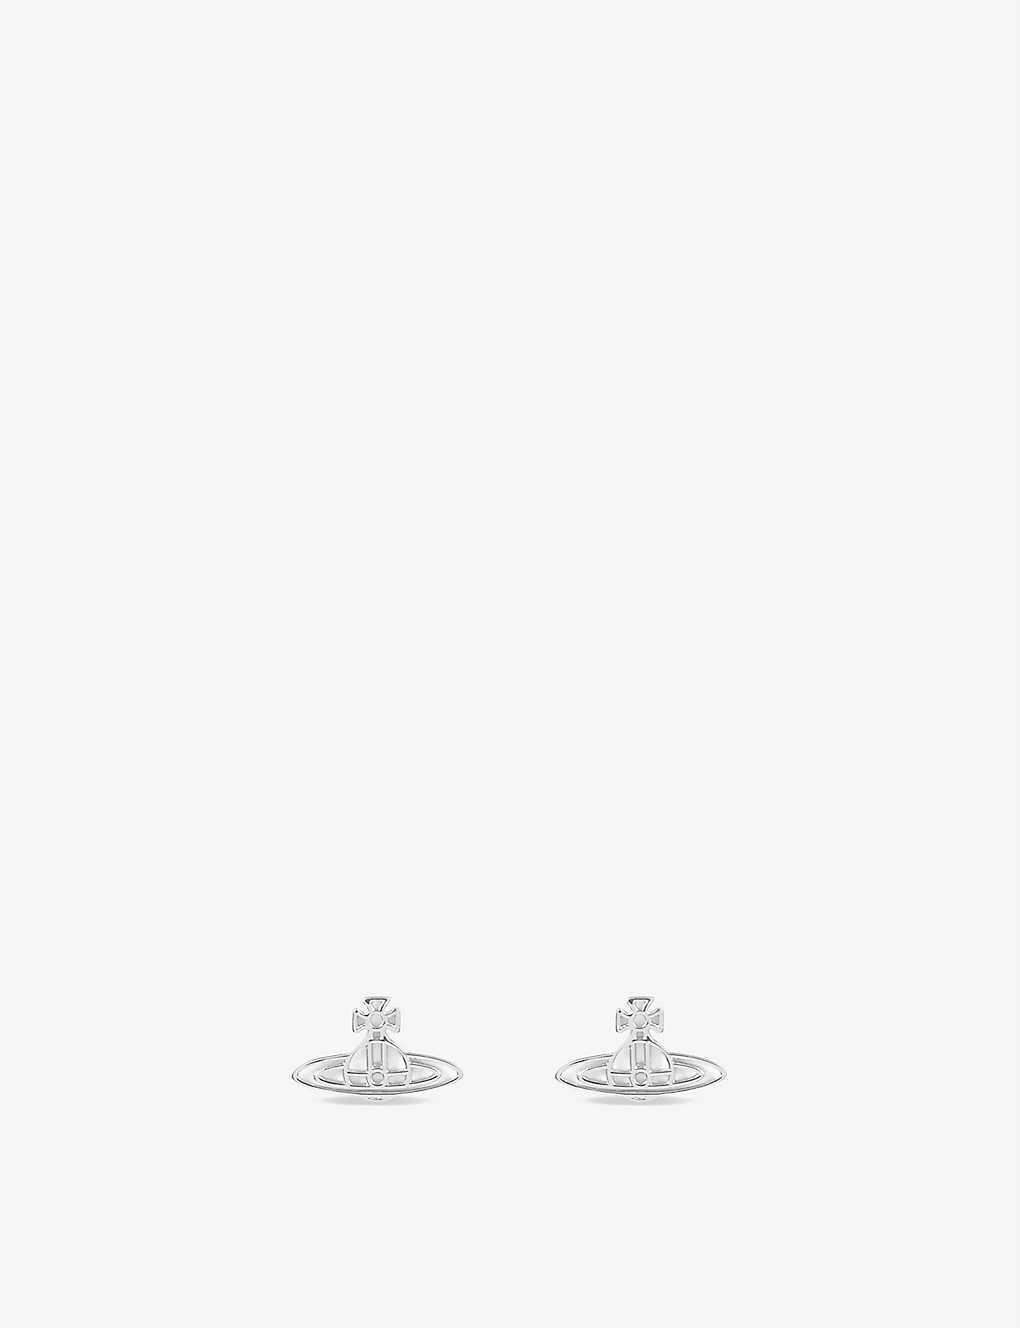 4e2f15e95 VIVIENNE WESTWOOD JEWELLERY - Thin lines flat orb stud earrings ...